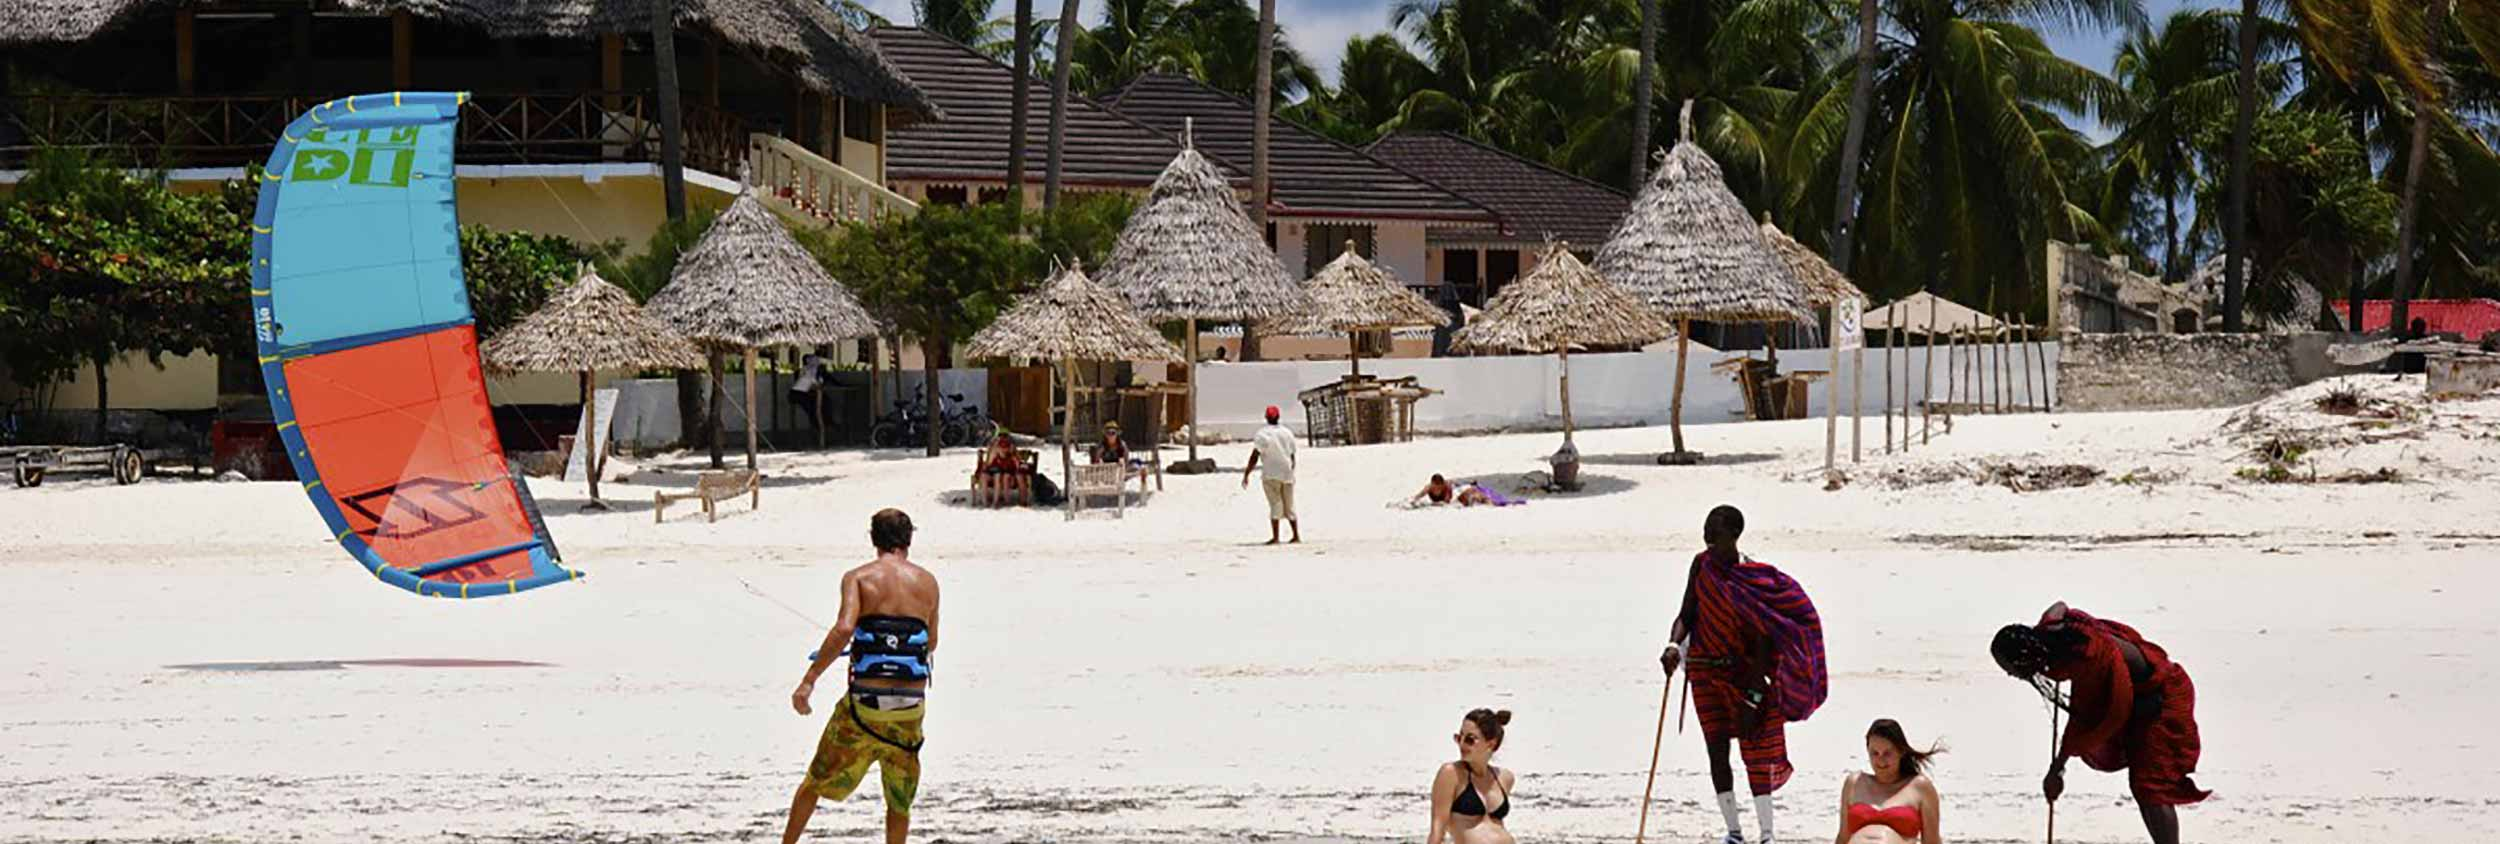 Zanzibar Tanzania Kiteworld travel